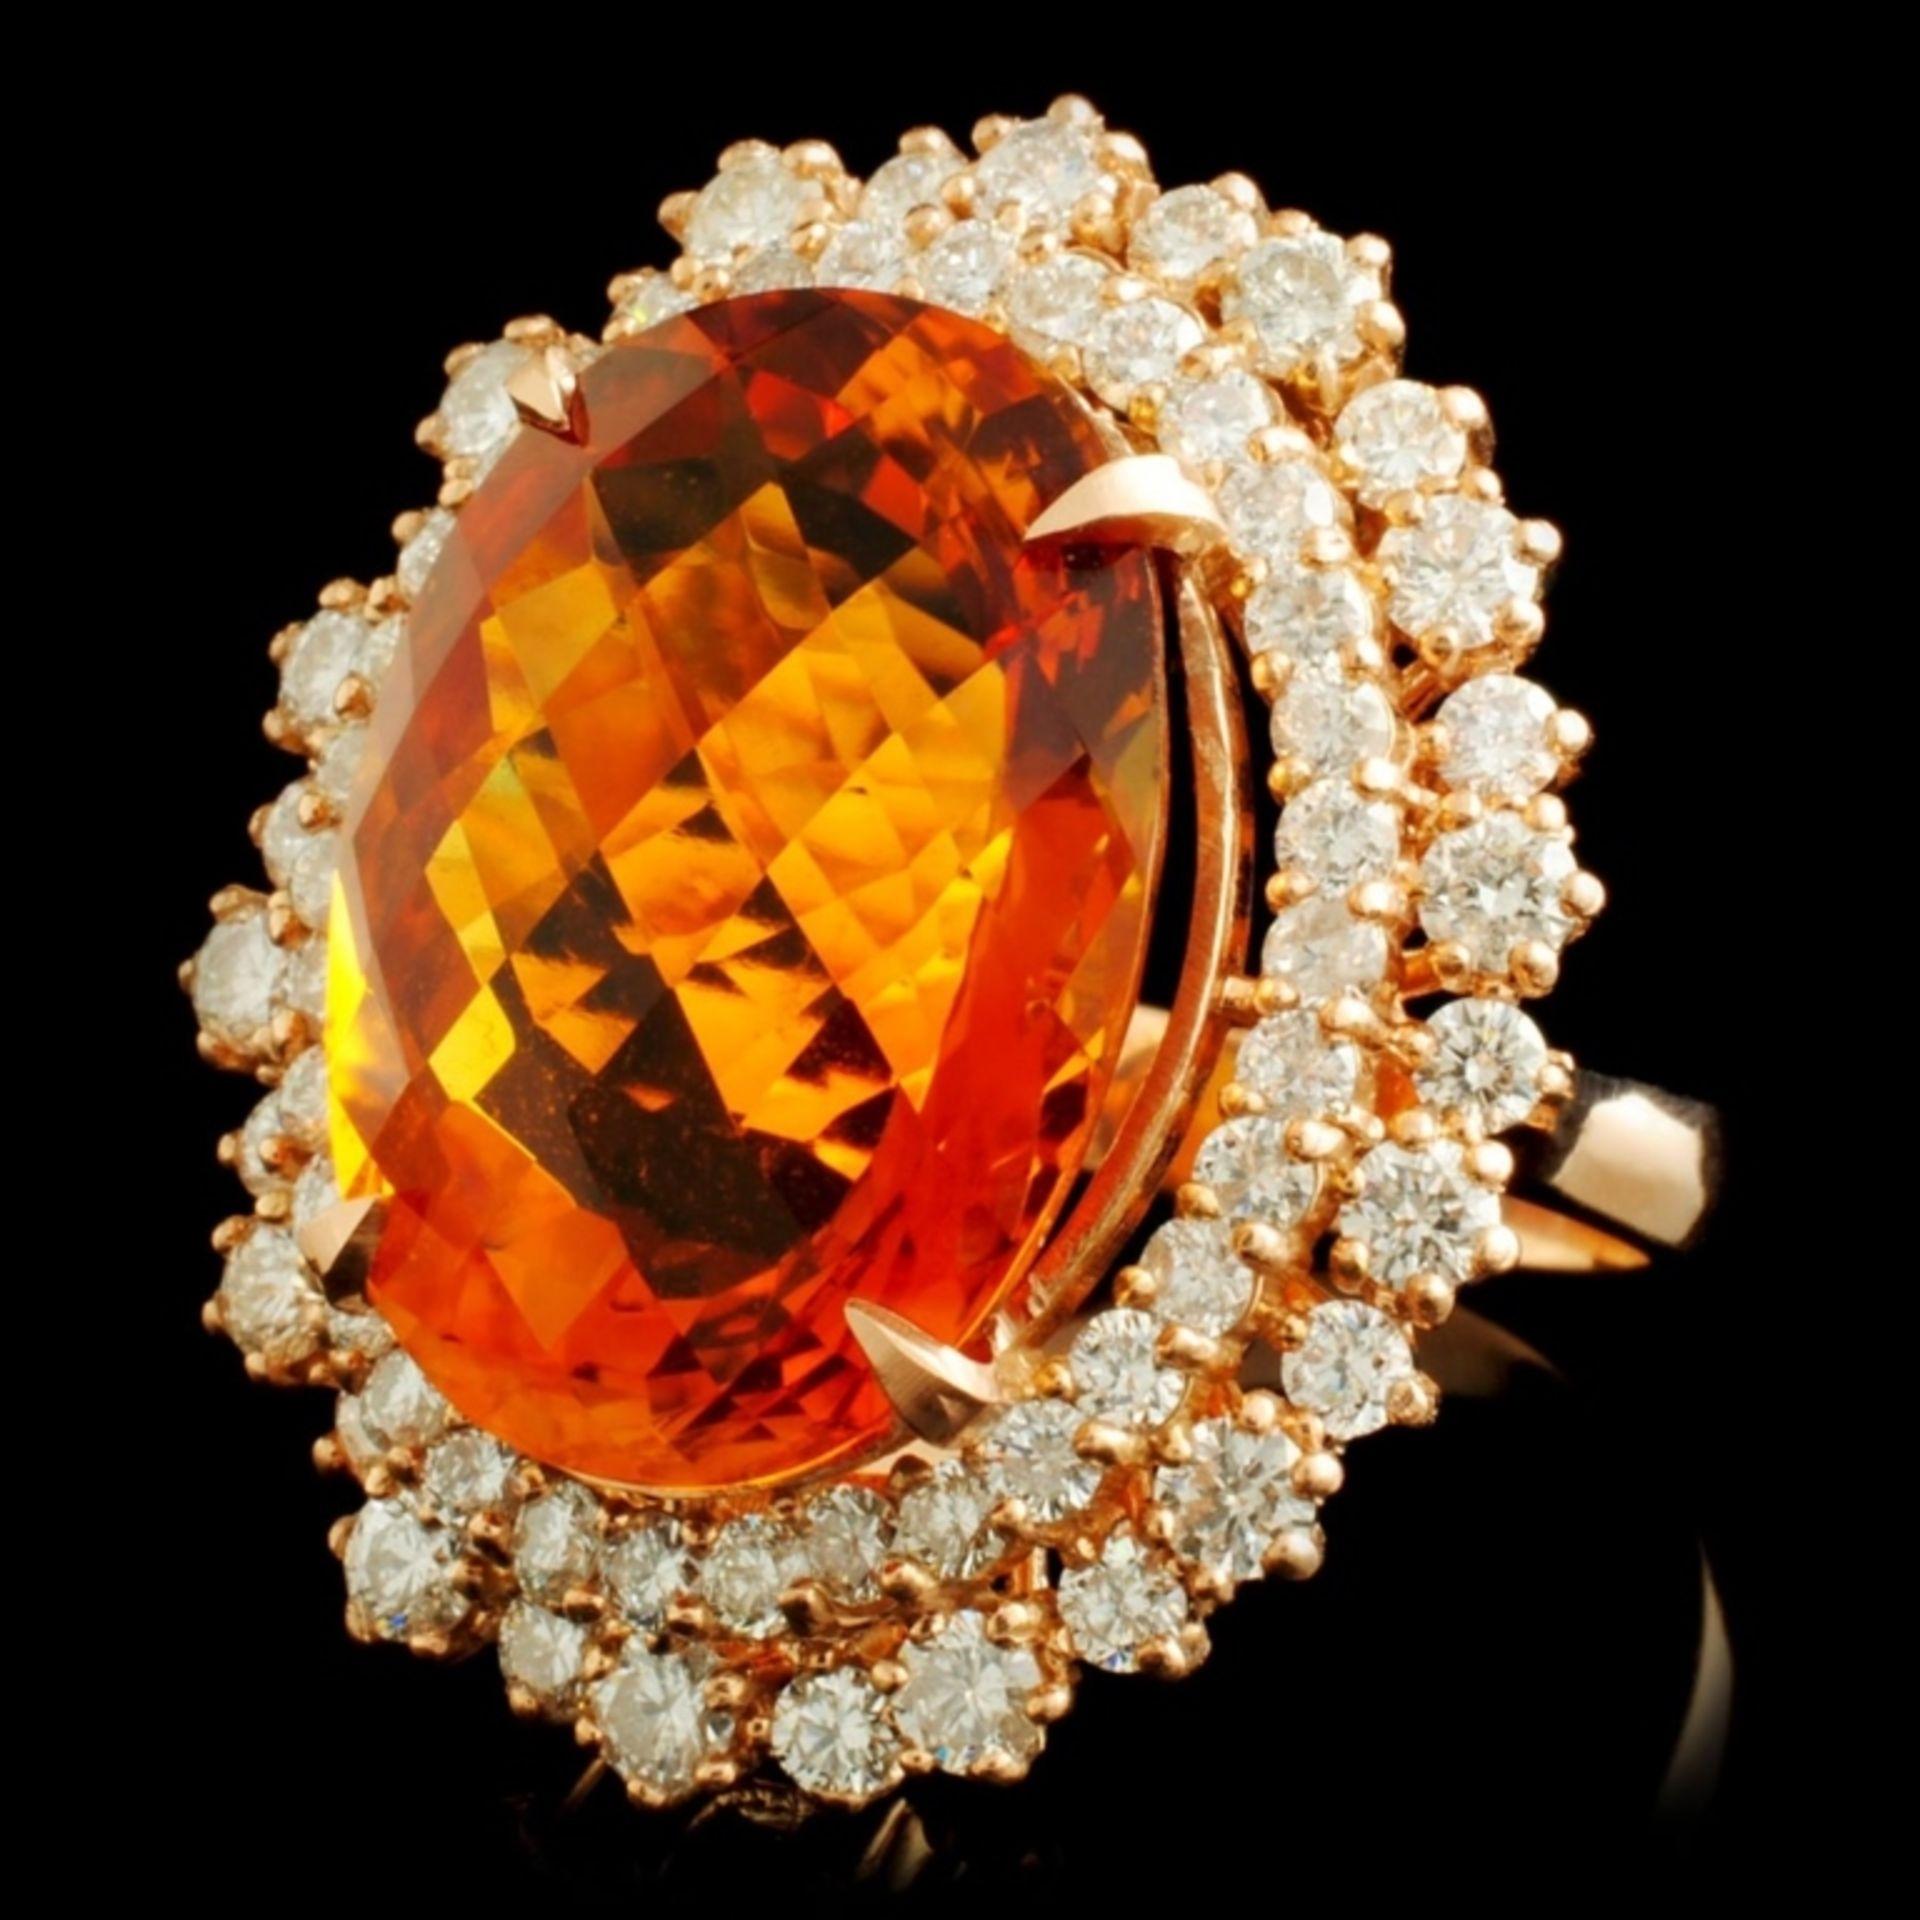 14K Gold 13.82ct Citrine & 2.30ctw Diamond Ring - Image 2 of 5